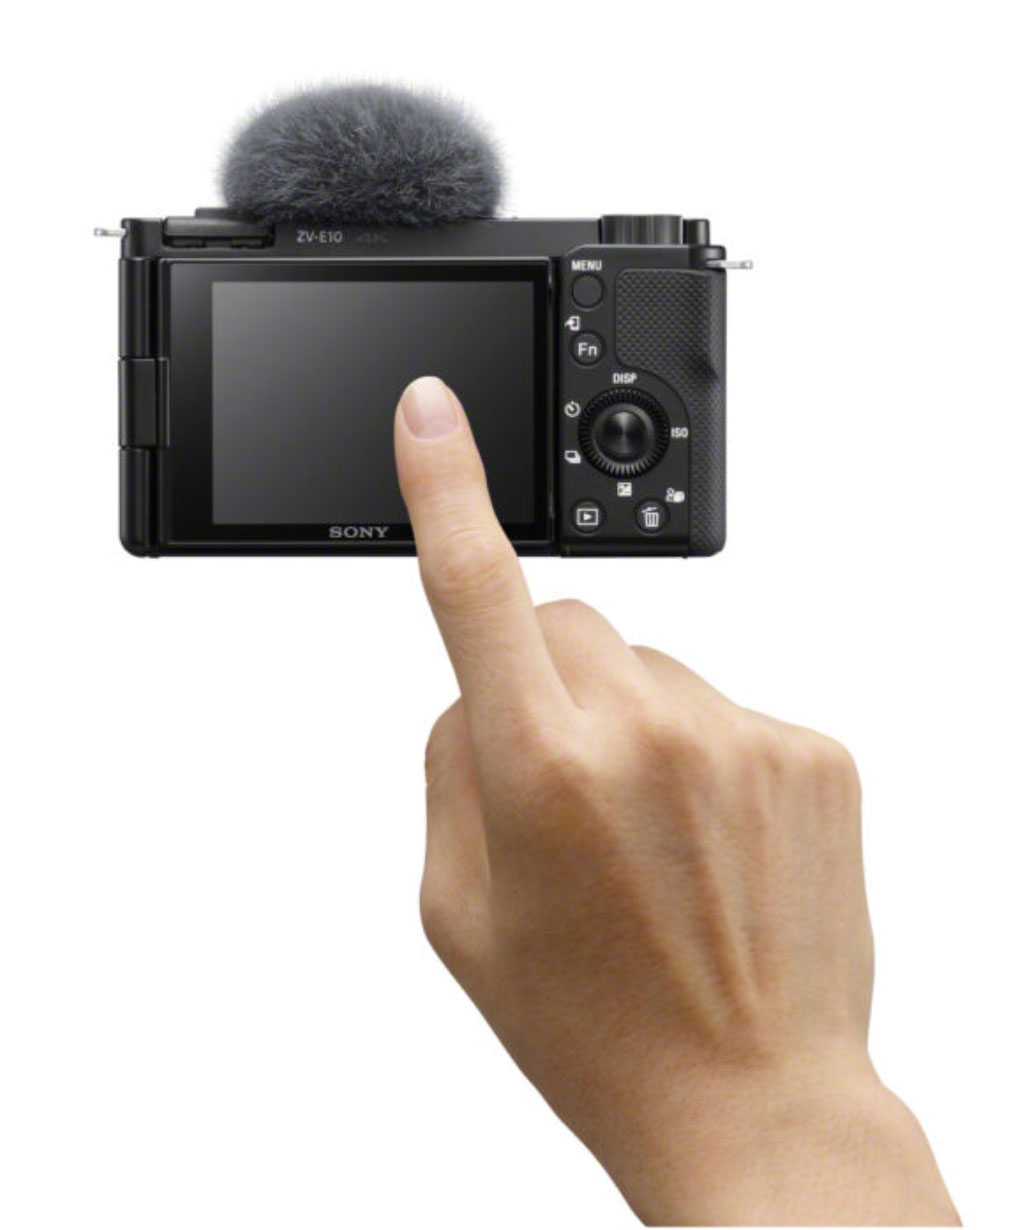 ZV-E10: the first Alpha series interchangeable lens vlog camera